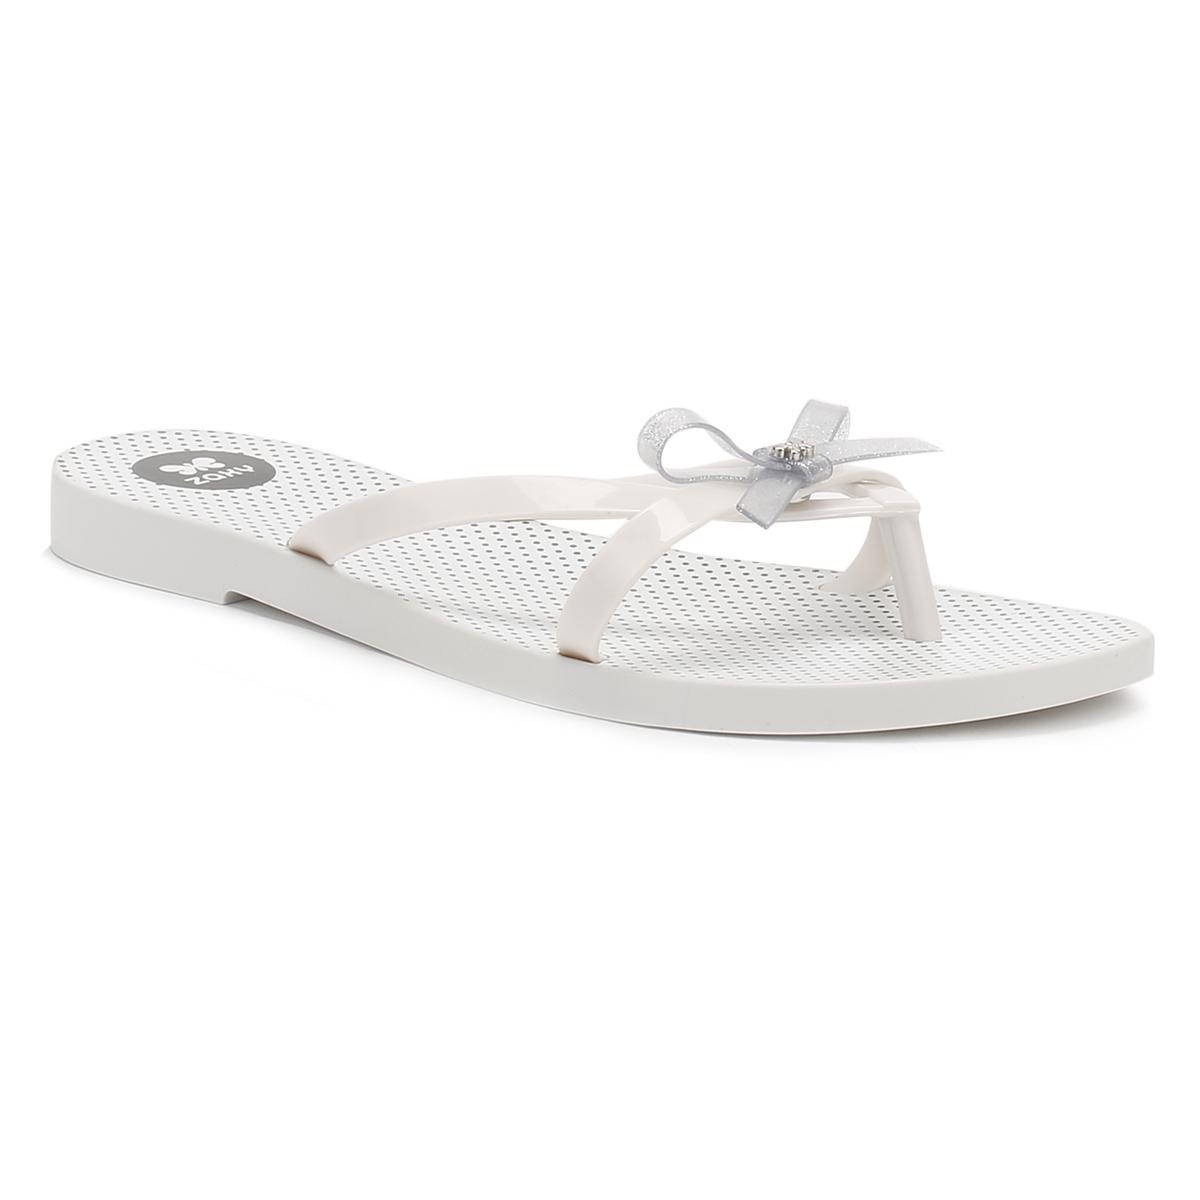 ad45c27becadea Zaxy Womens White Glitter Fresh Bow Flip Flops Women s Flip Flops ...